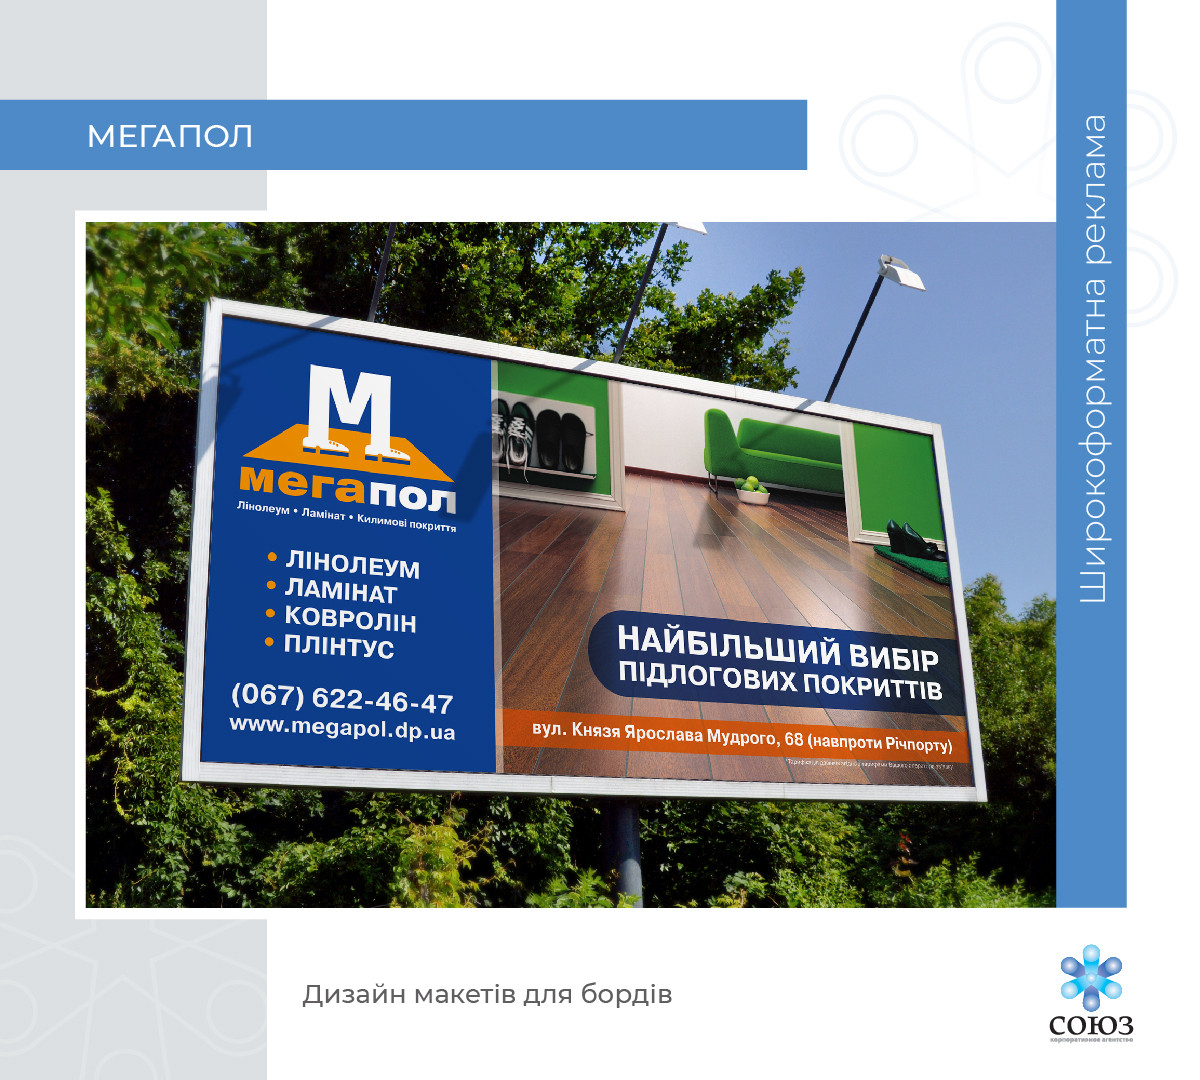 mh_design present 2021-07.jpg